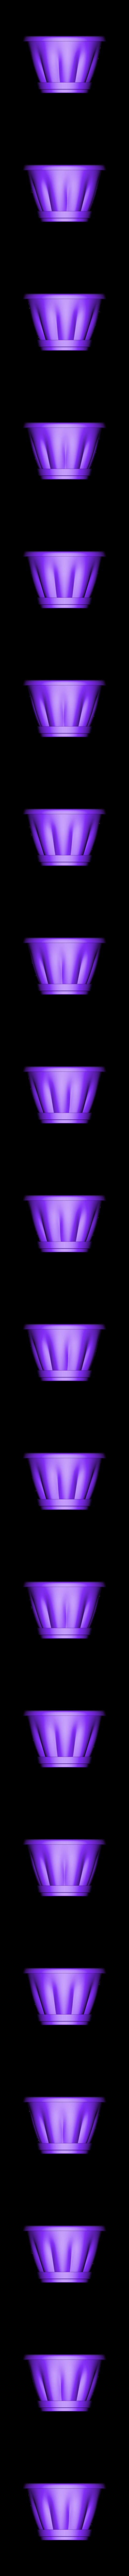 3dp.STL Download STL file Flowerpot • 3D printing model, 3dmodelsByVadim